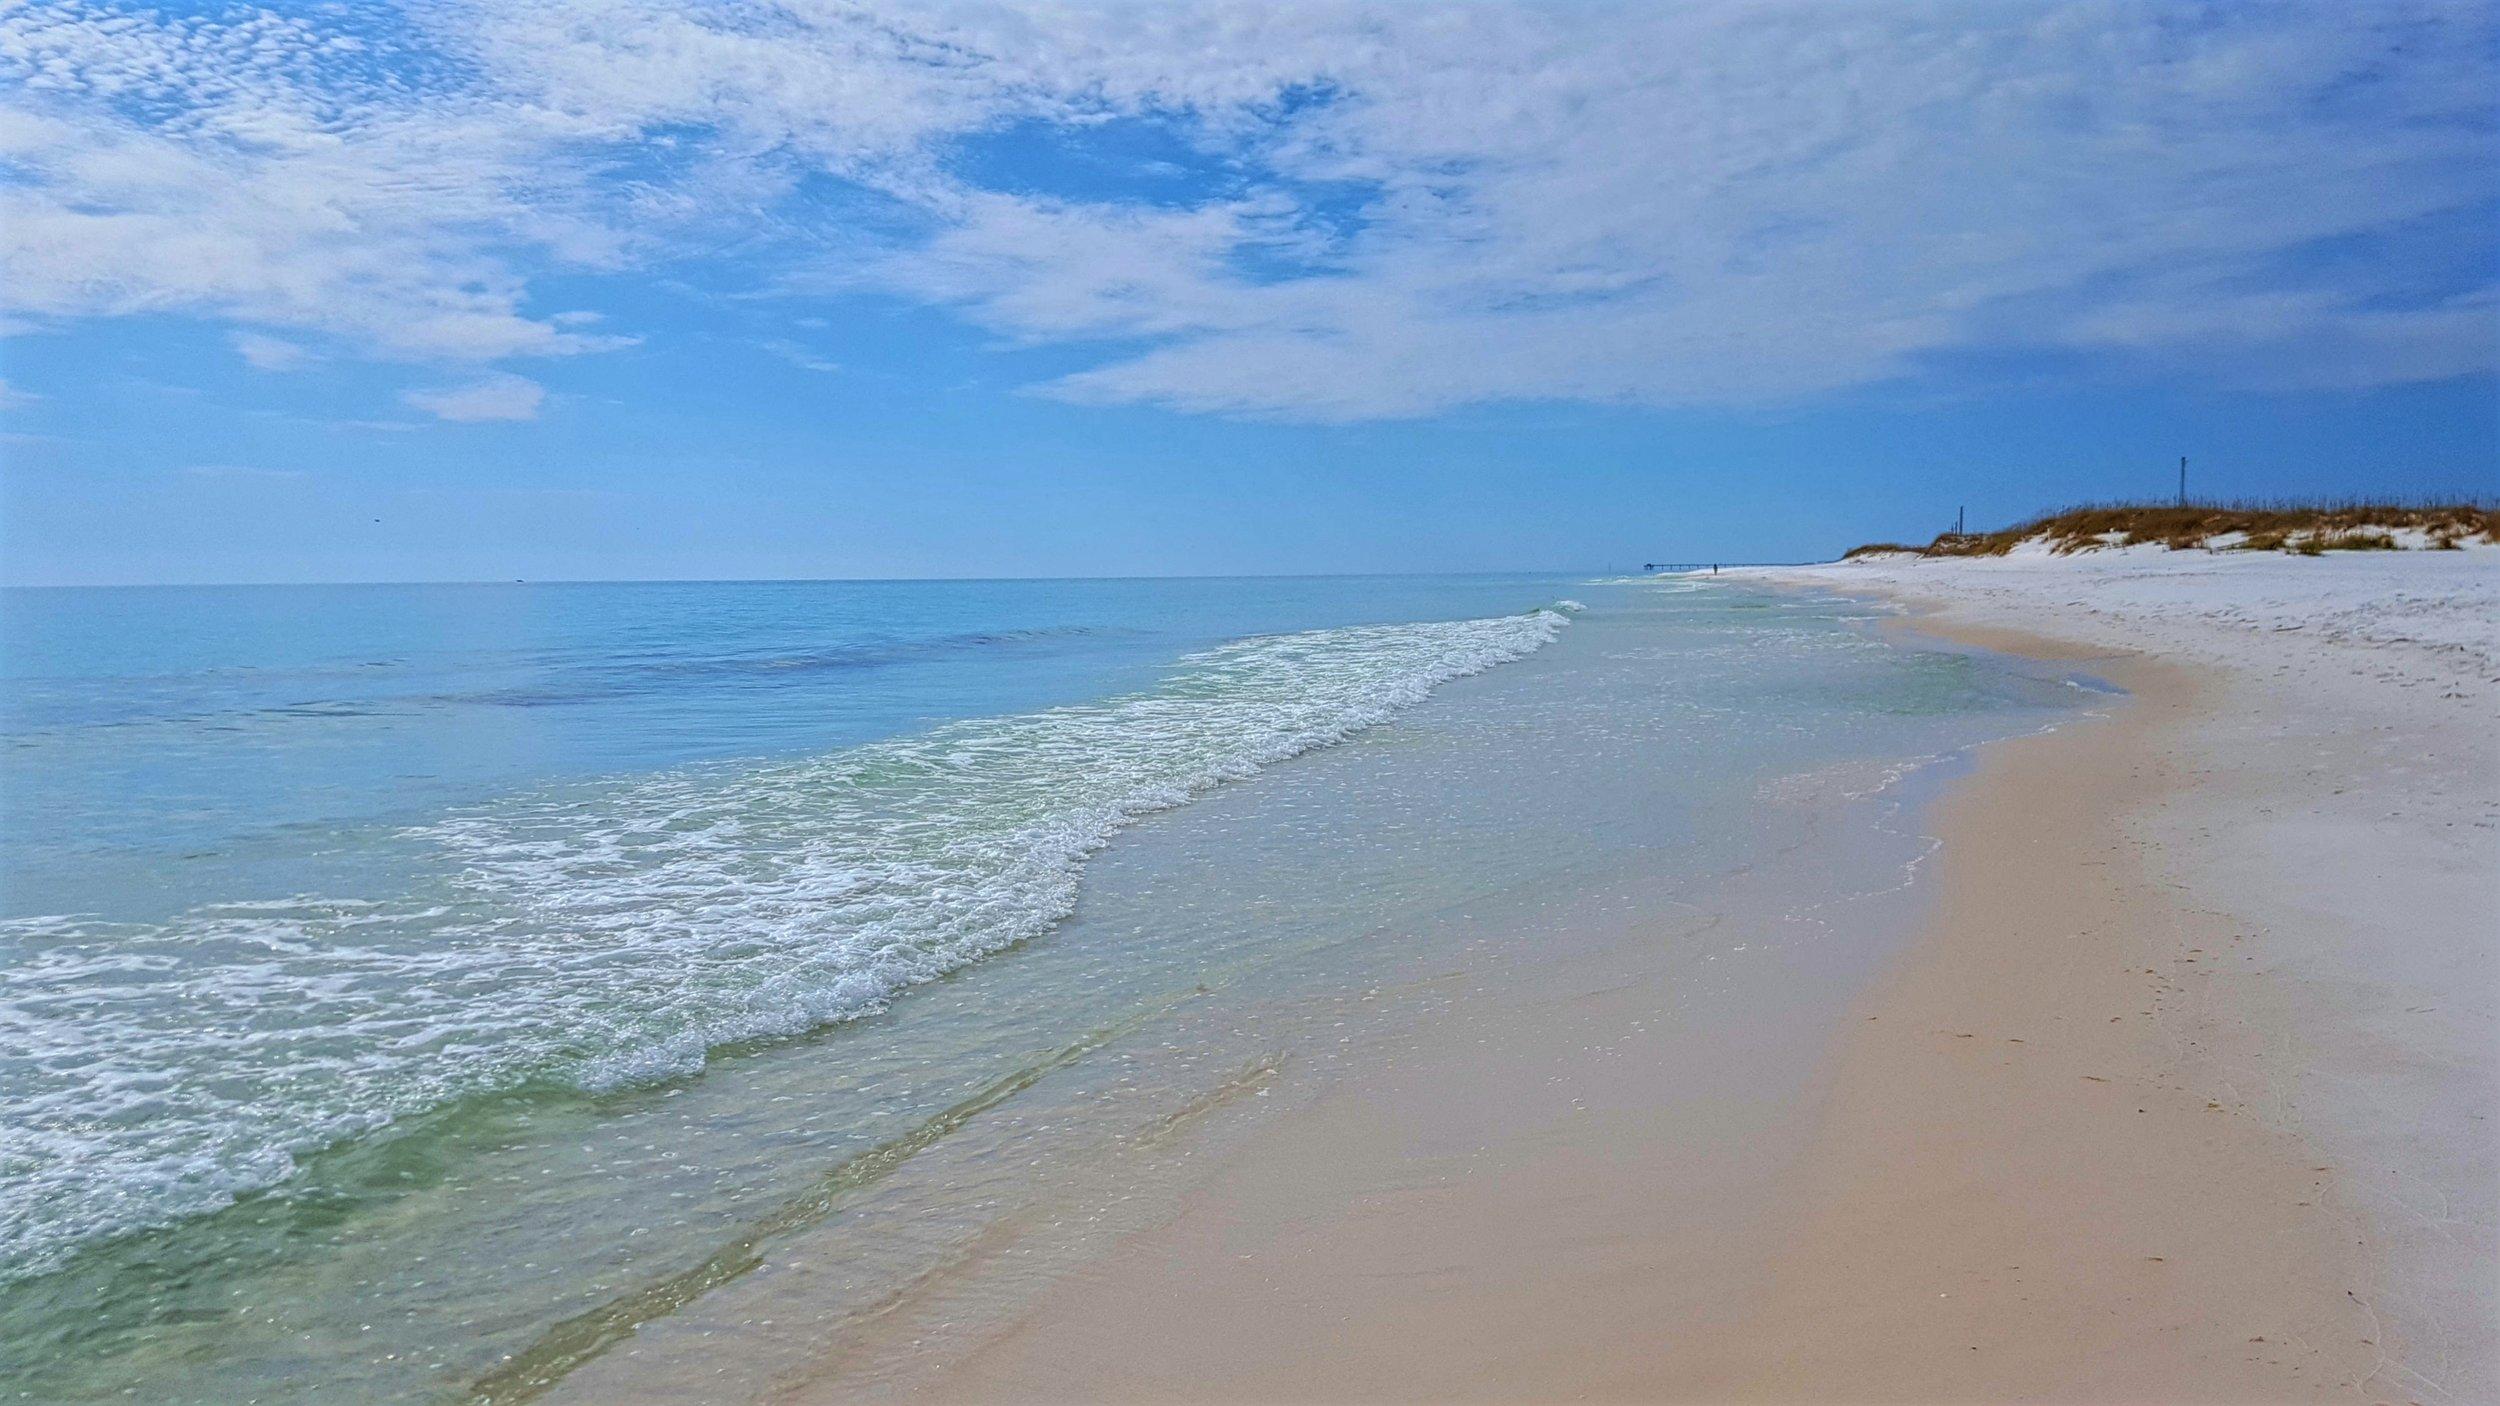 Okaloosa Beach